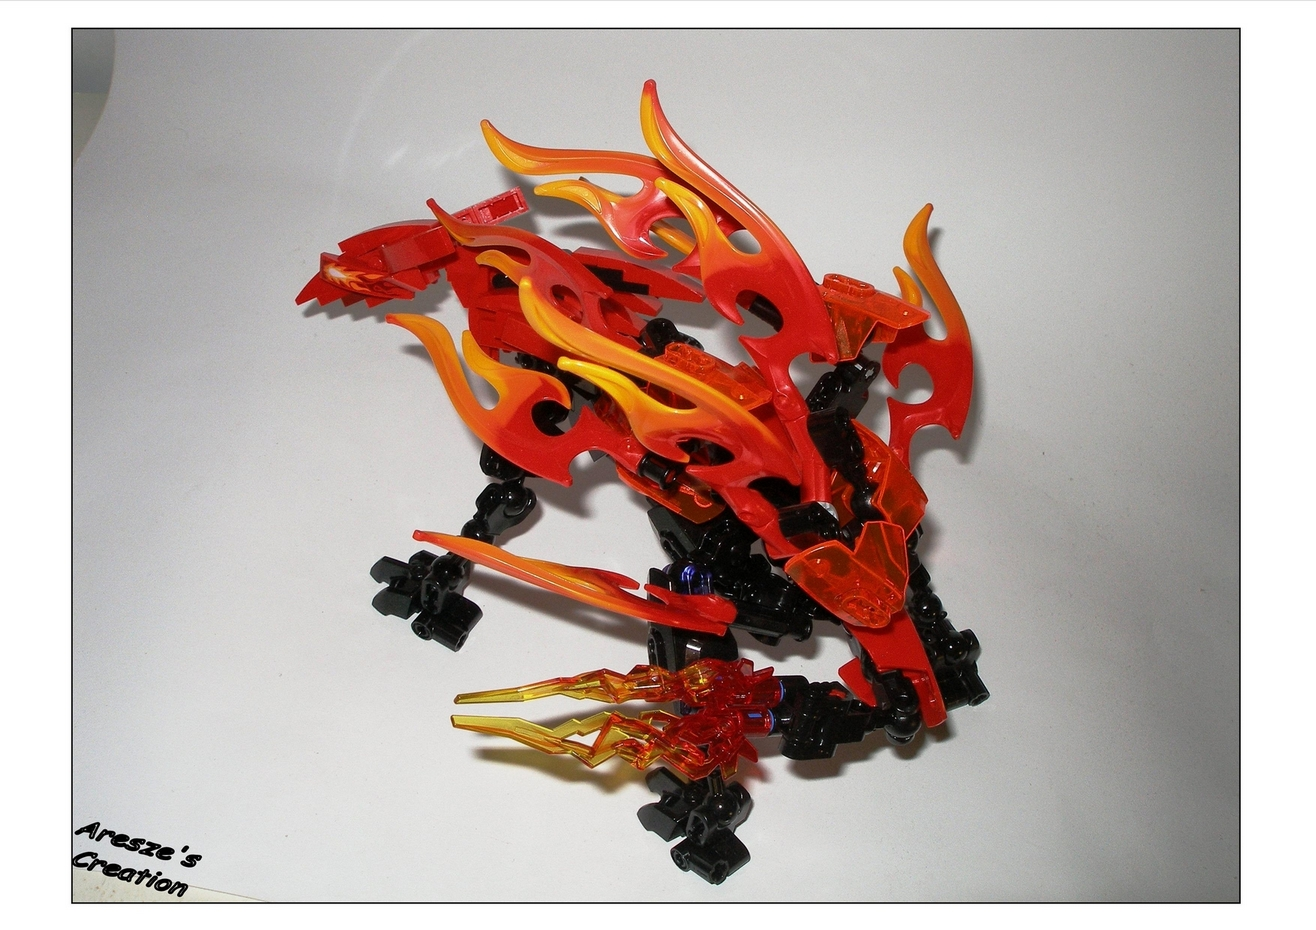 aresze moc - Nine-tailed Fox 018